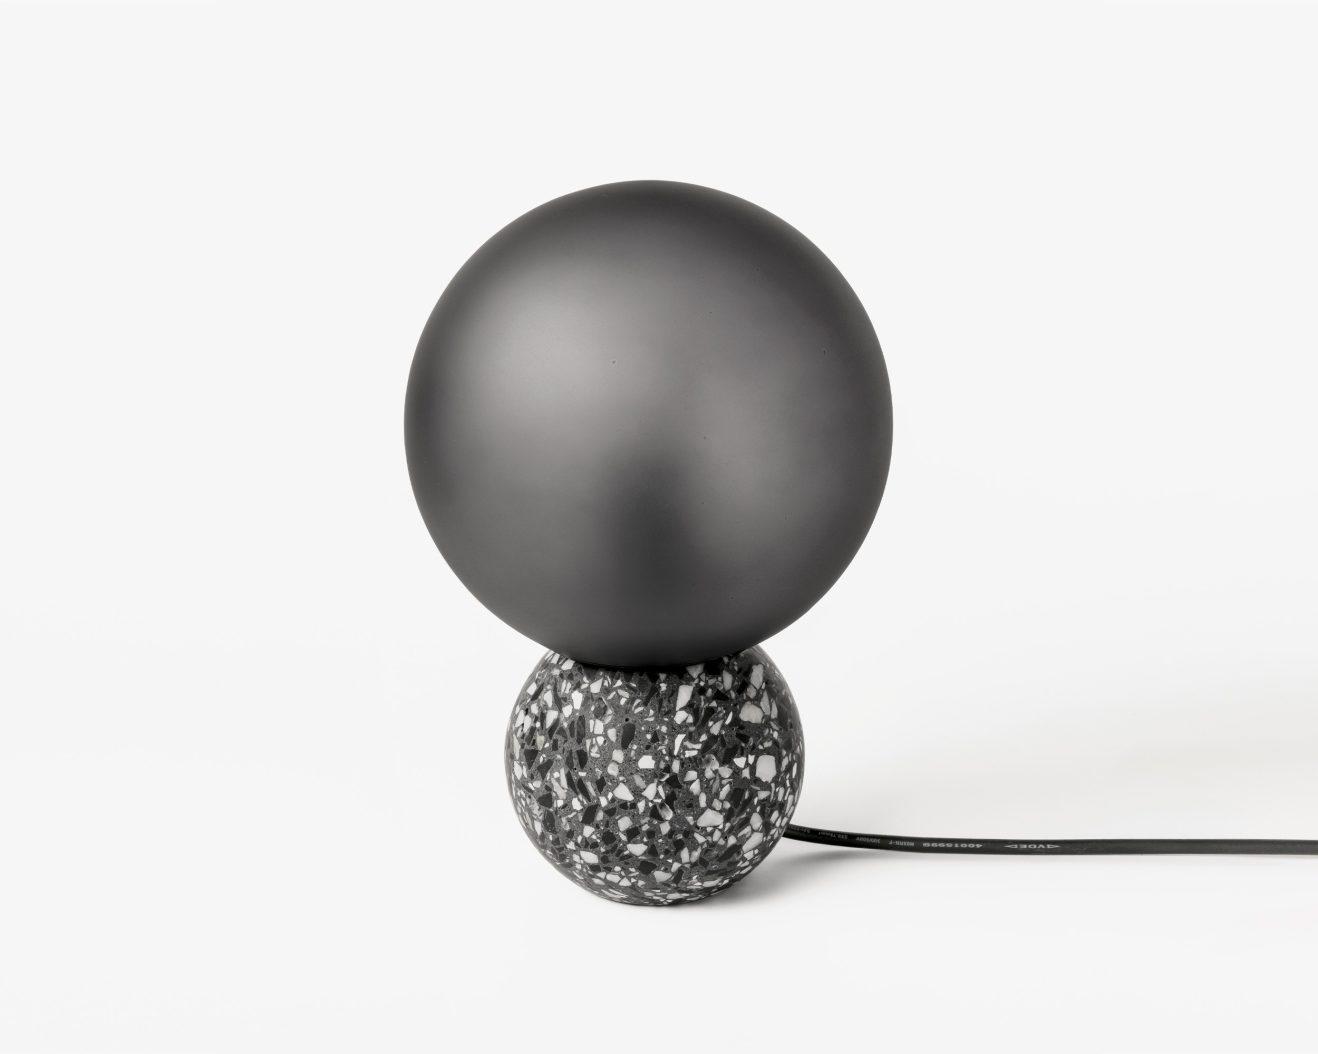 BentuDesign-Black-Terrazzo-Lamp-8-